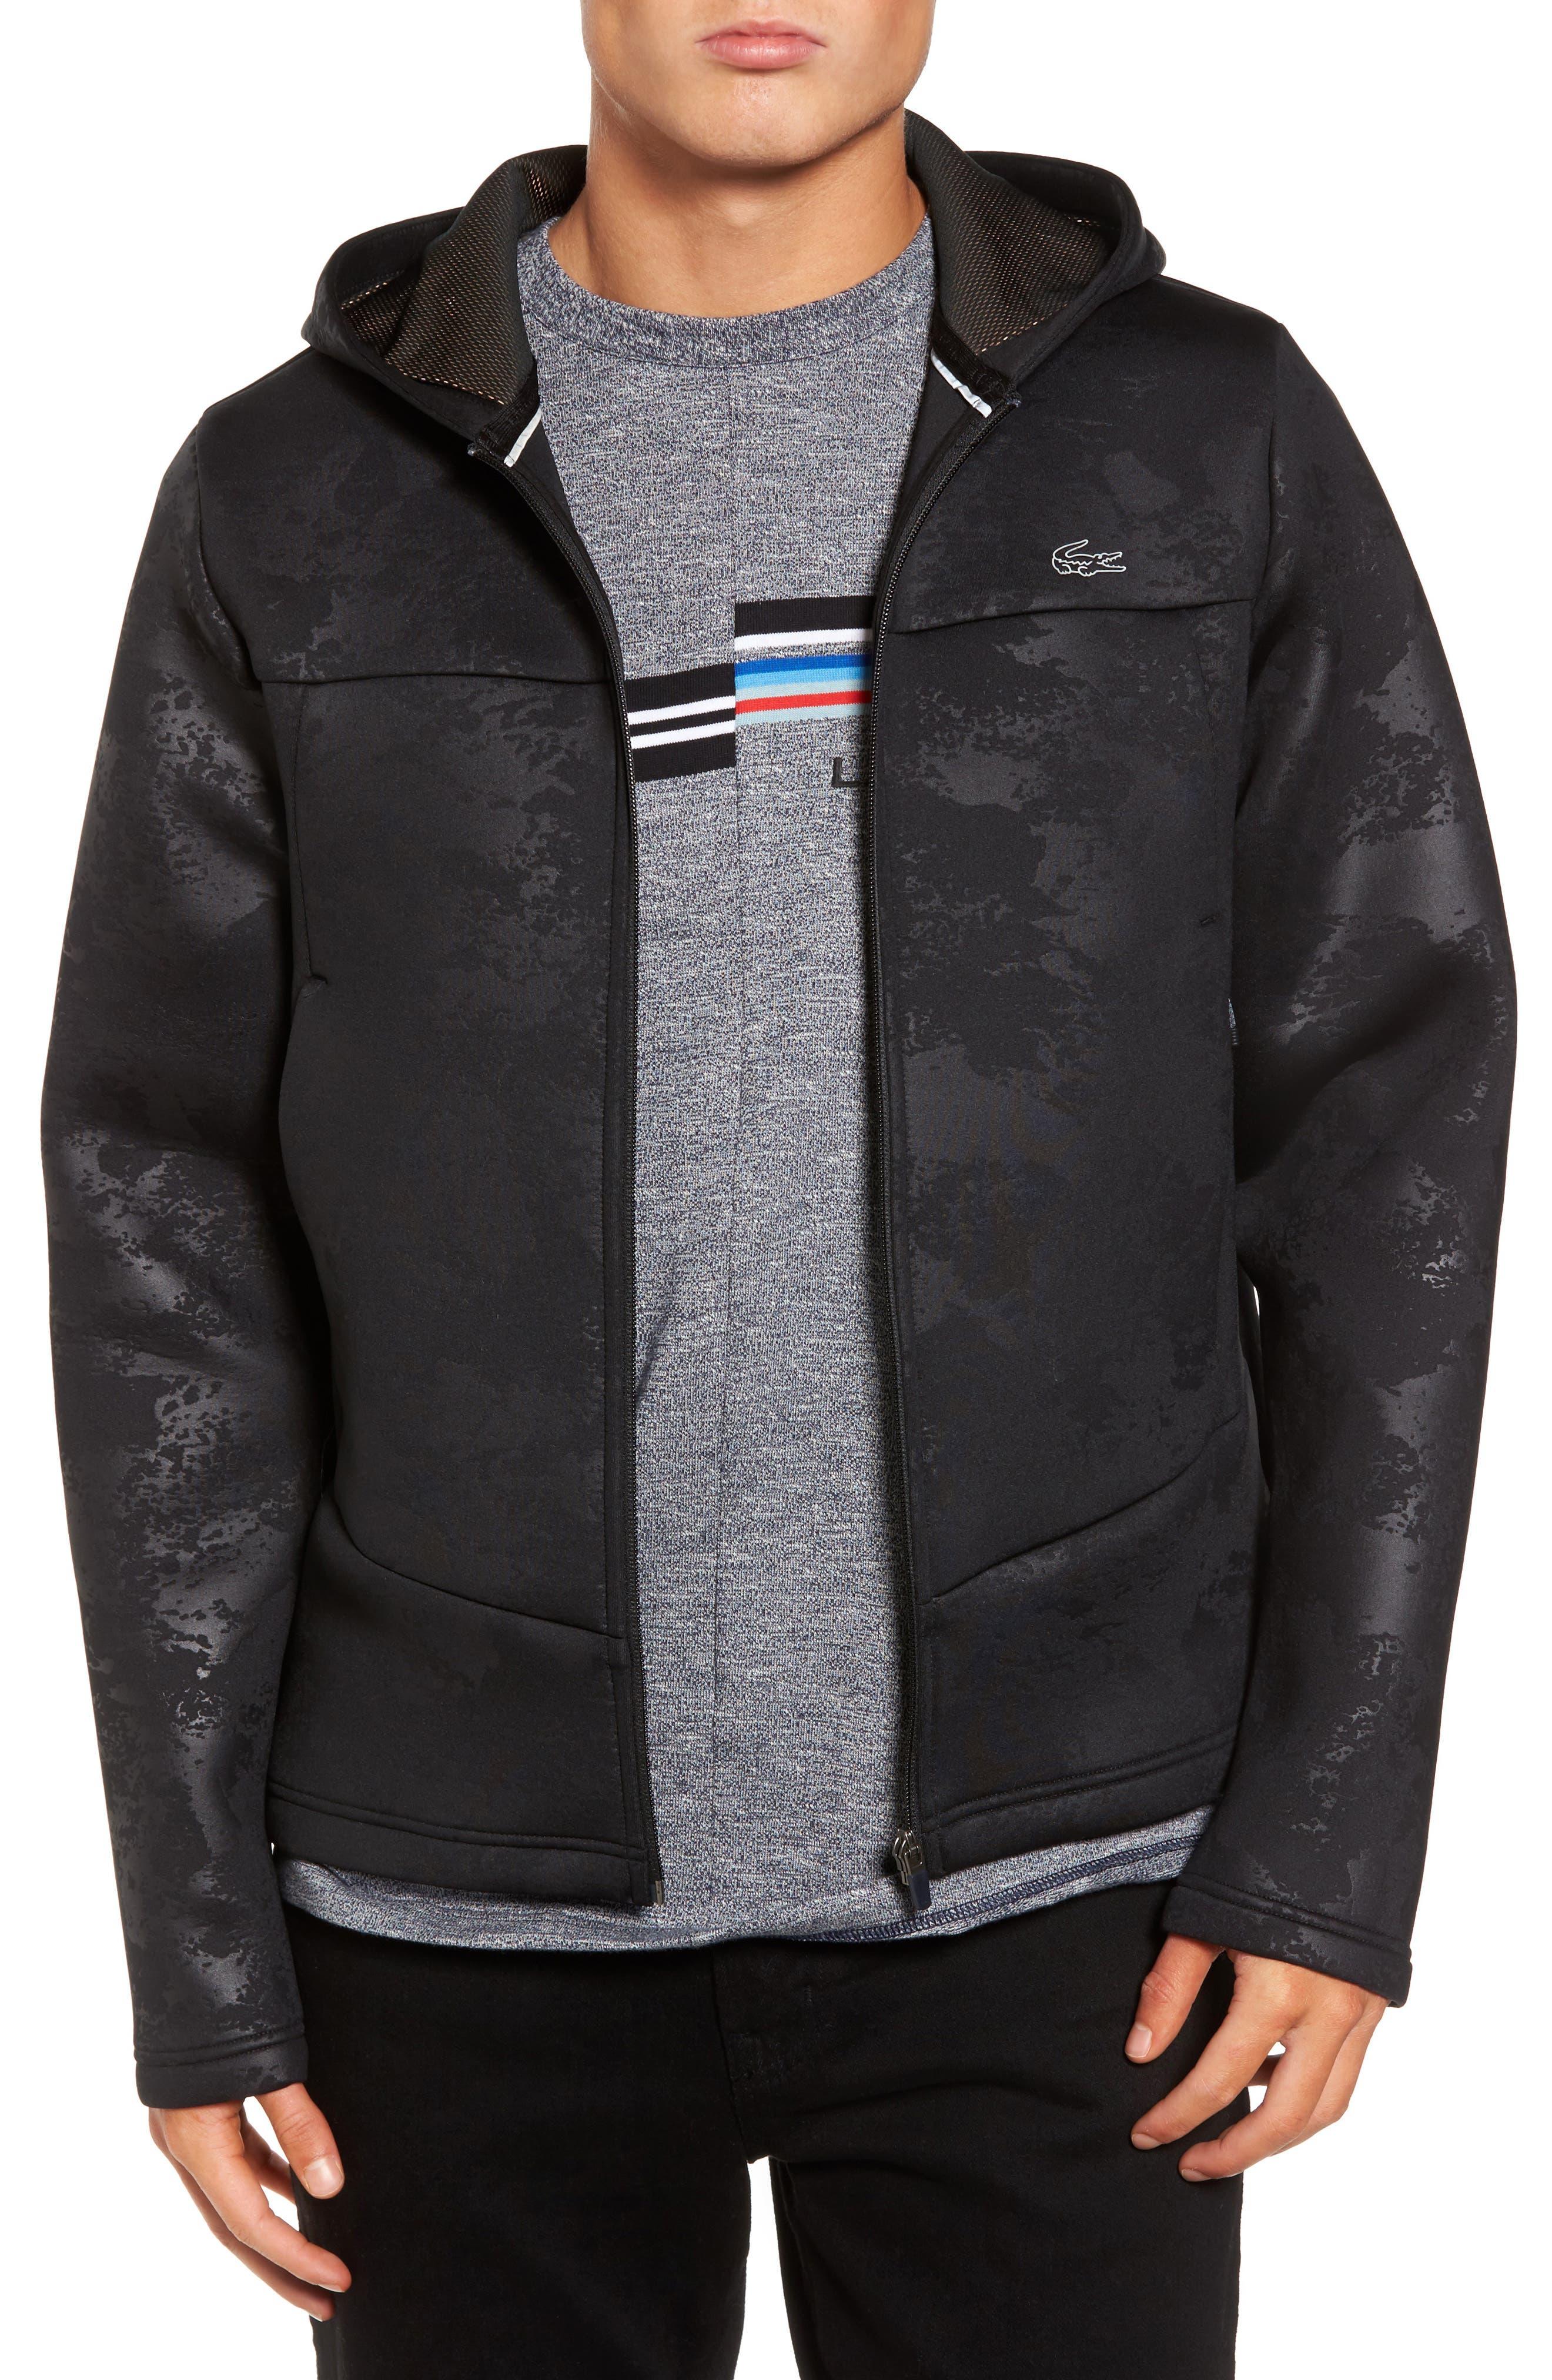 Lacoste Full Zip Hooded Fleece Jacket